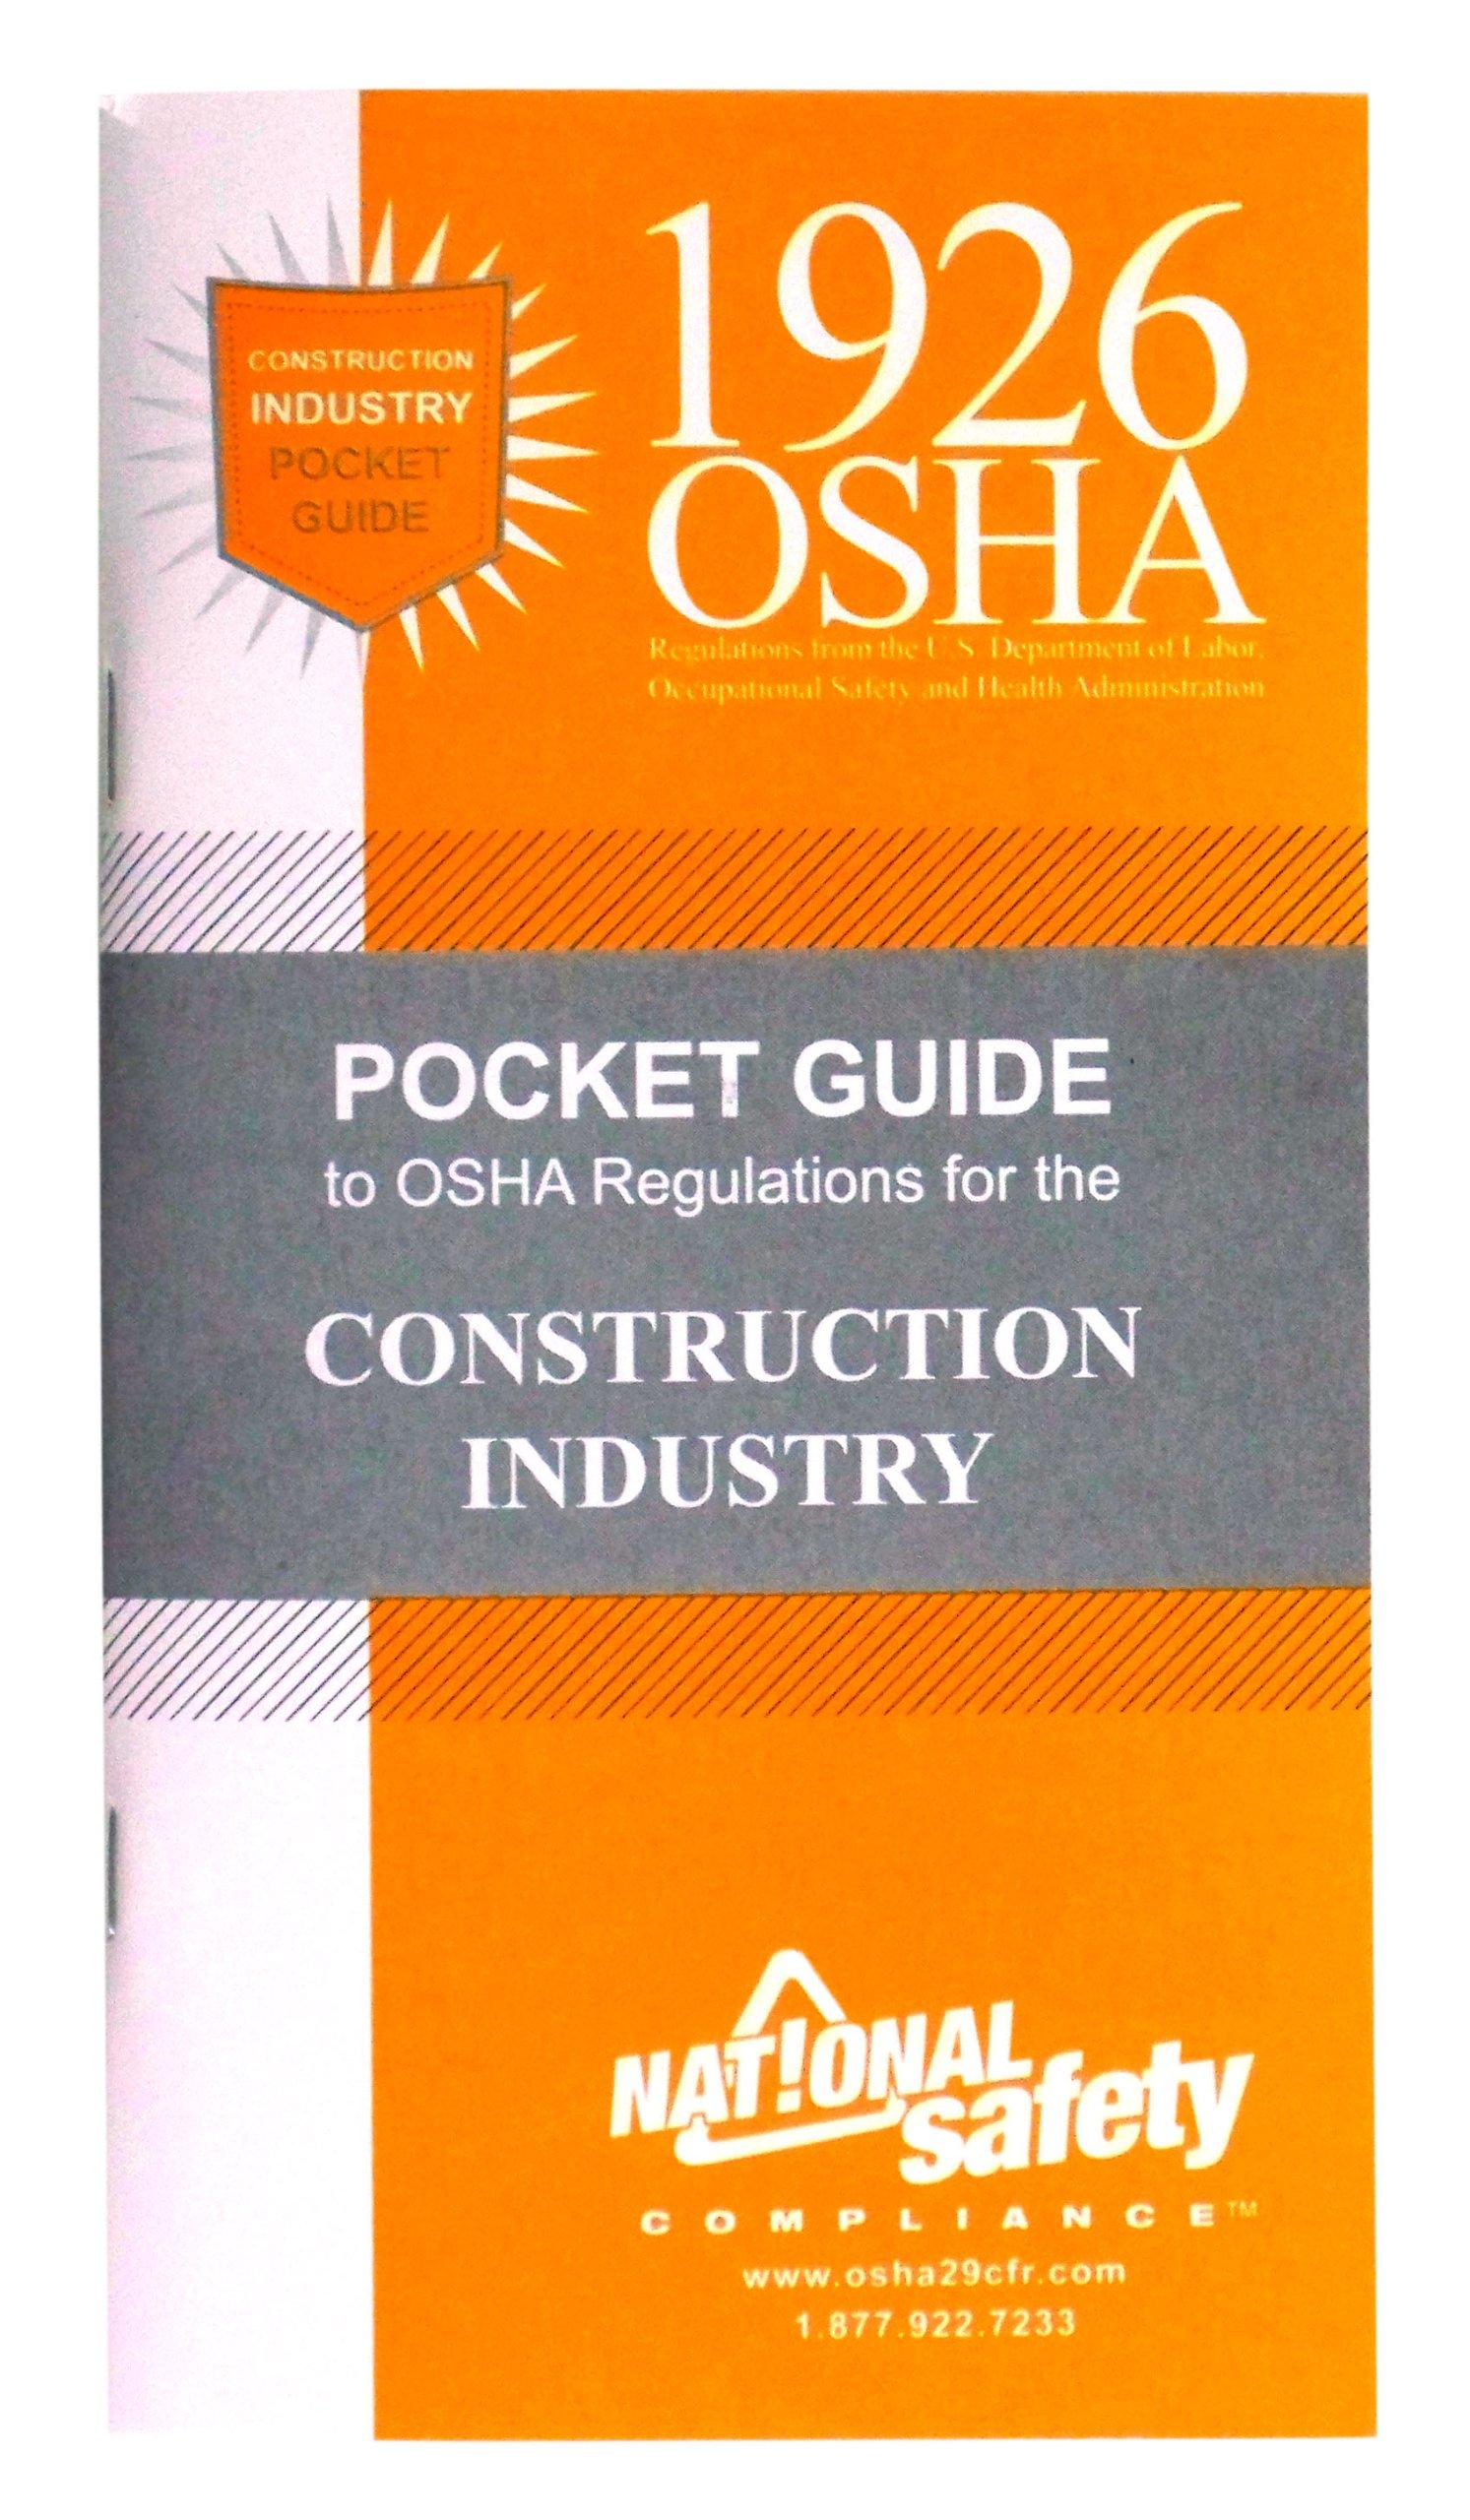 1926 OSHA Construction Pocket Guide: Inc National Safety Compliance:  9781619460676: Amazon.com: Books